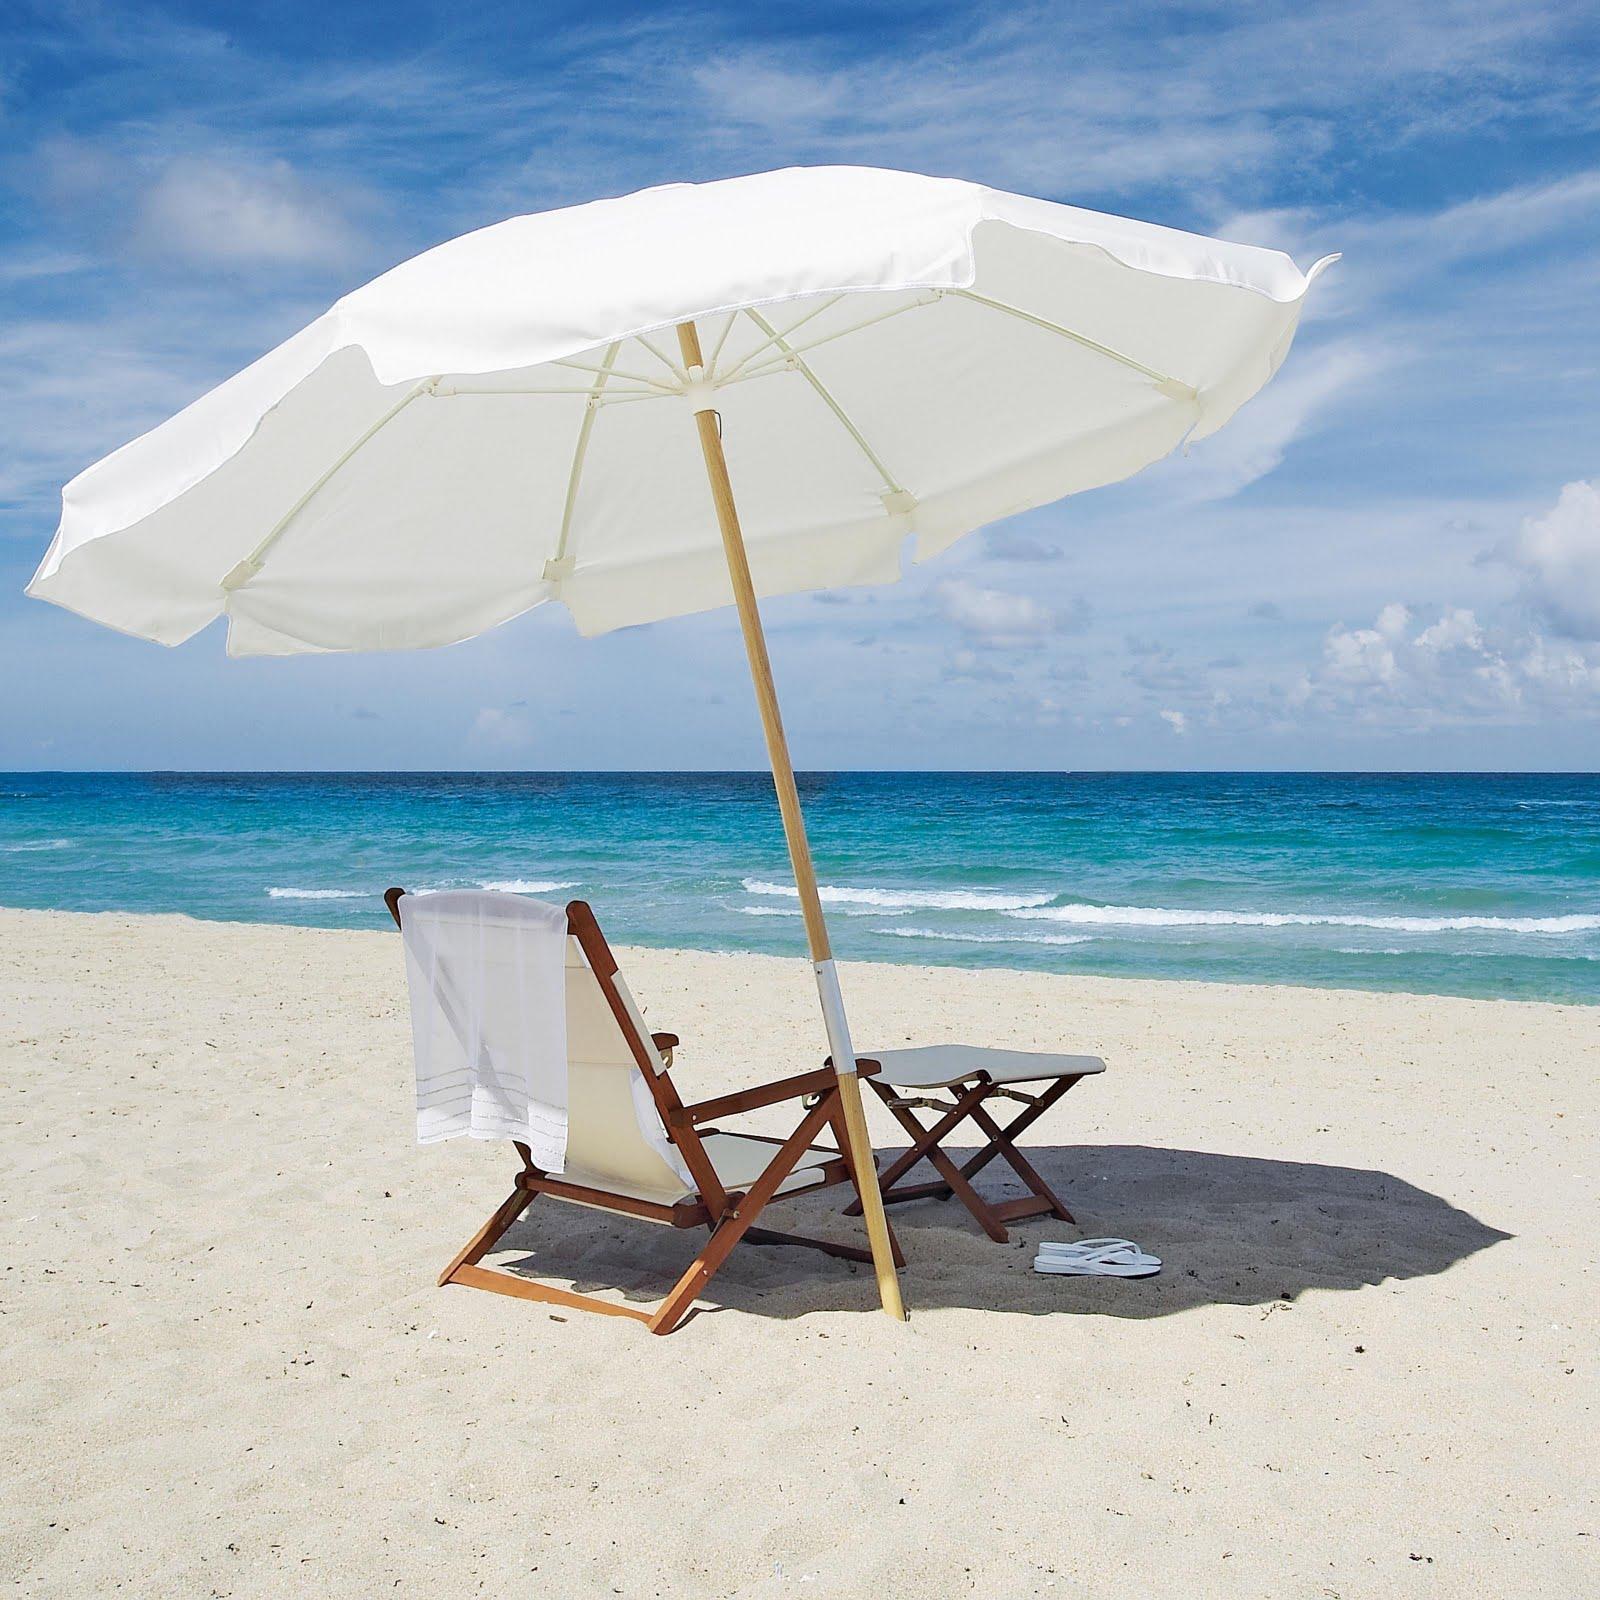 Coming soon – Westin Timeshare in Cancun